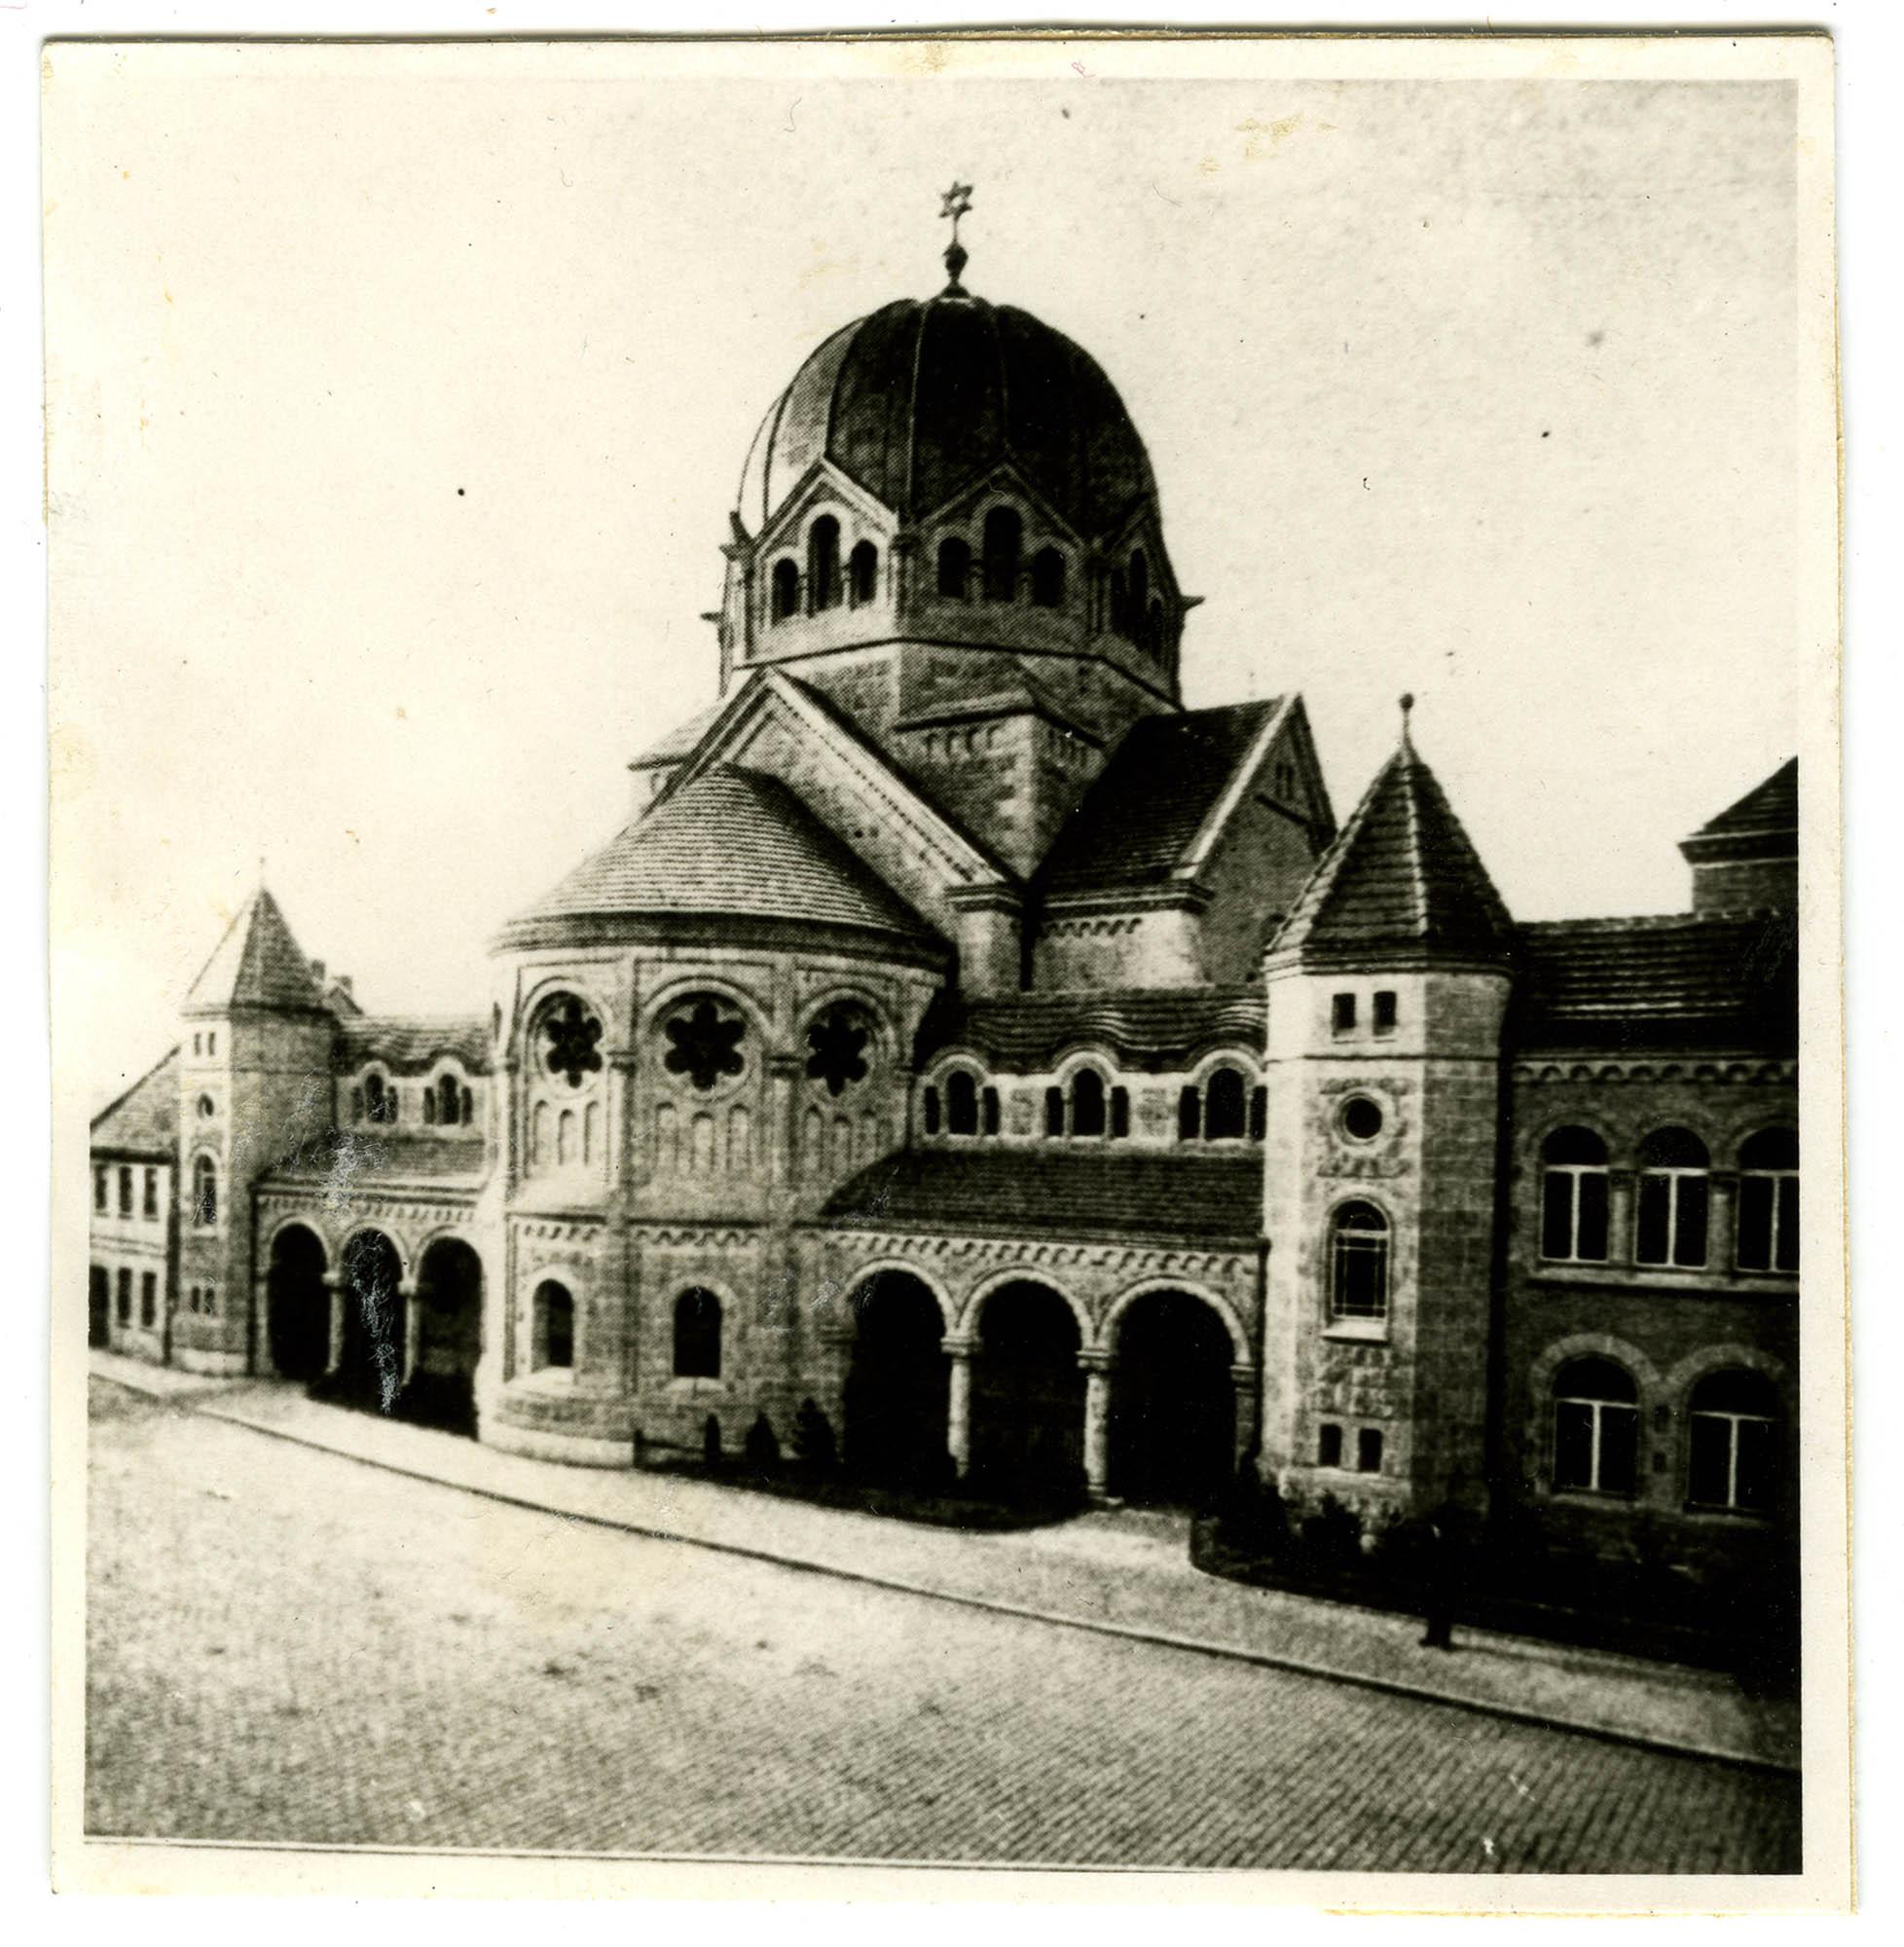 [Alte Synagoge, Dessau]